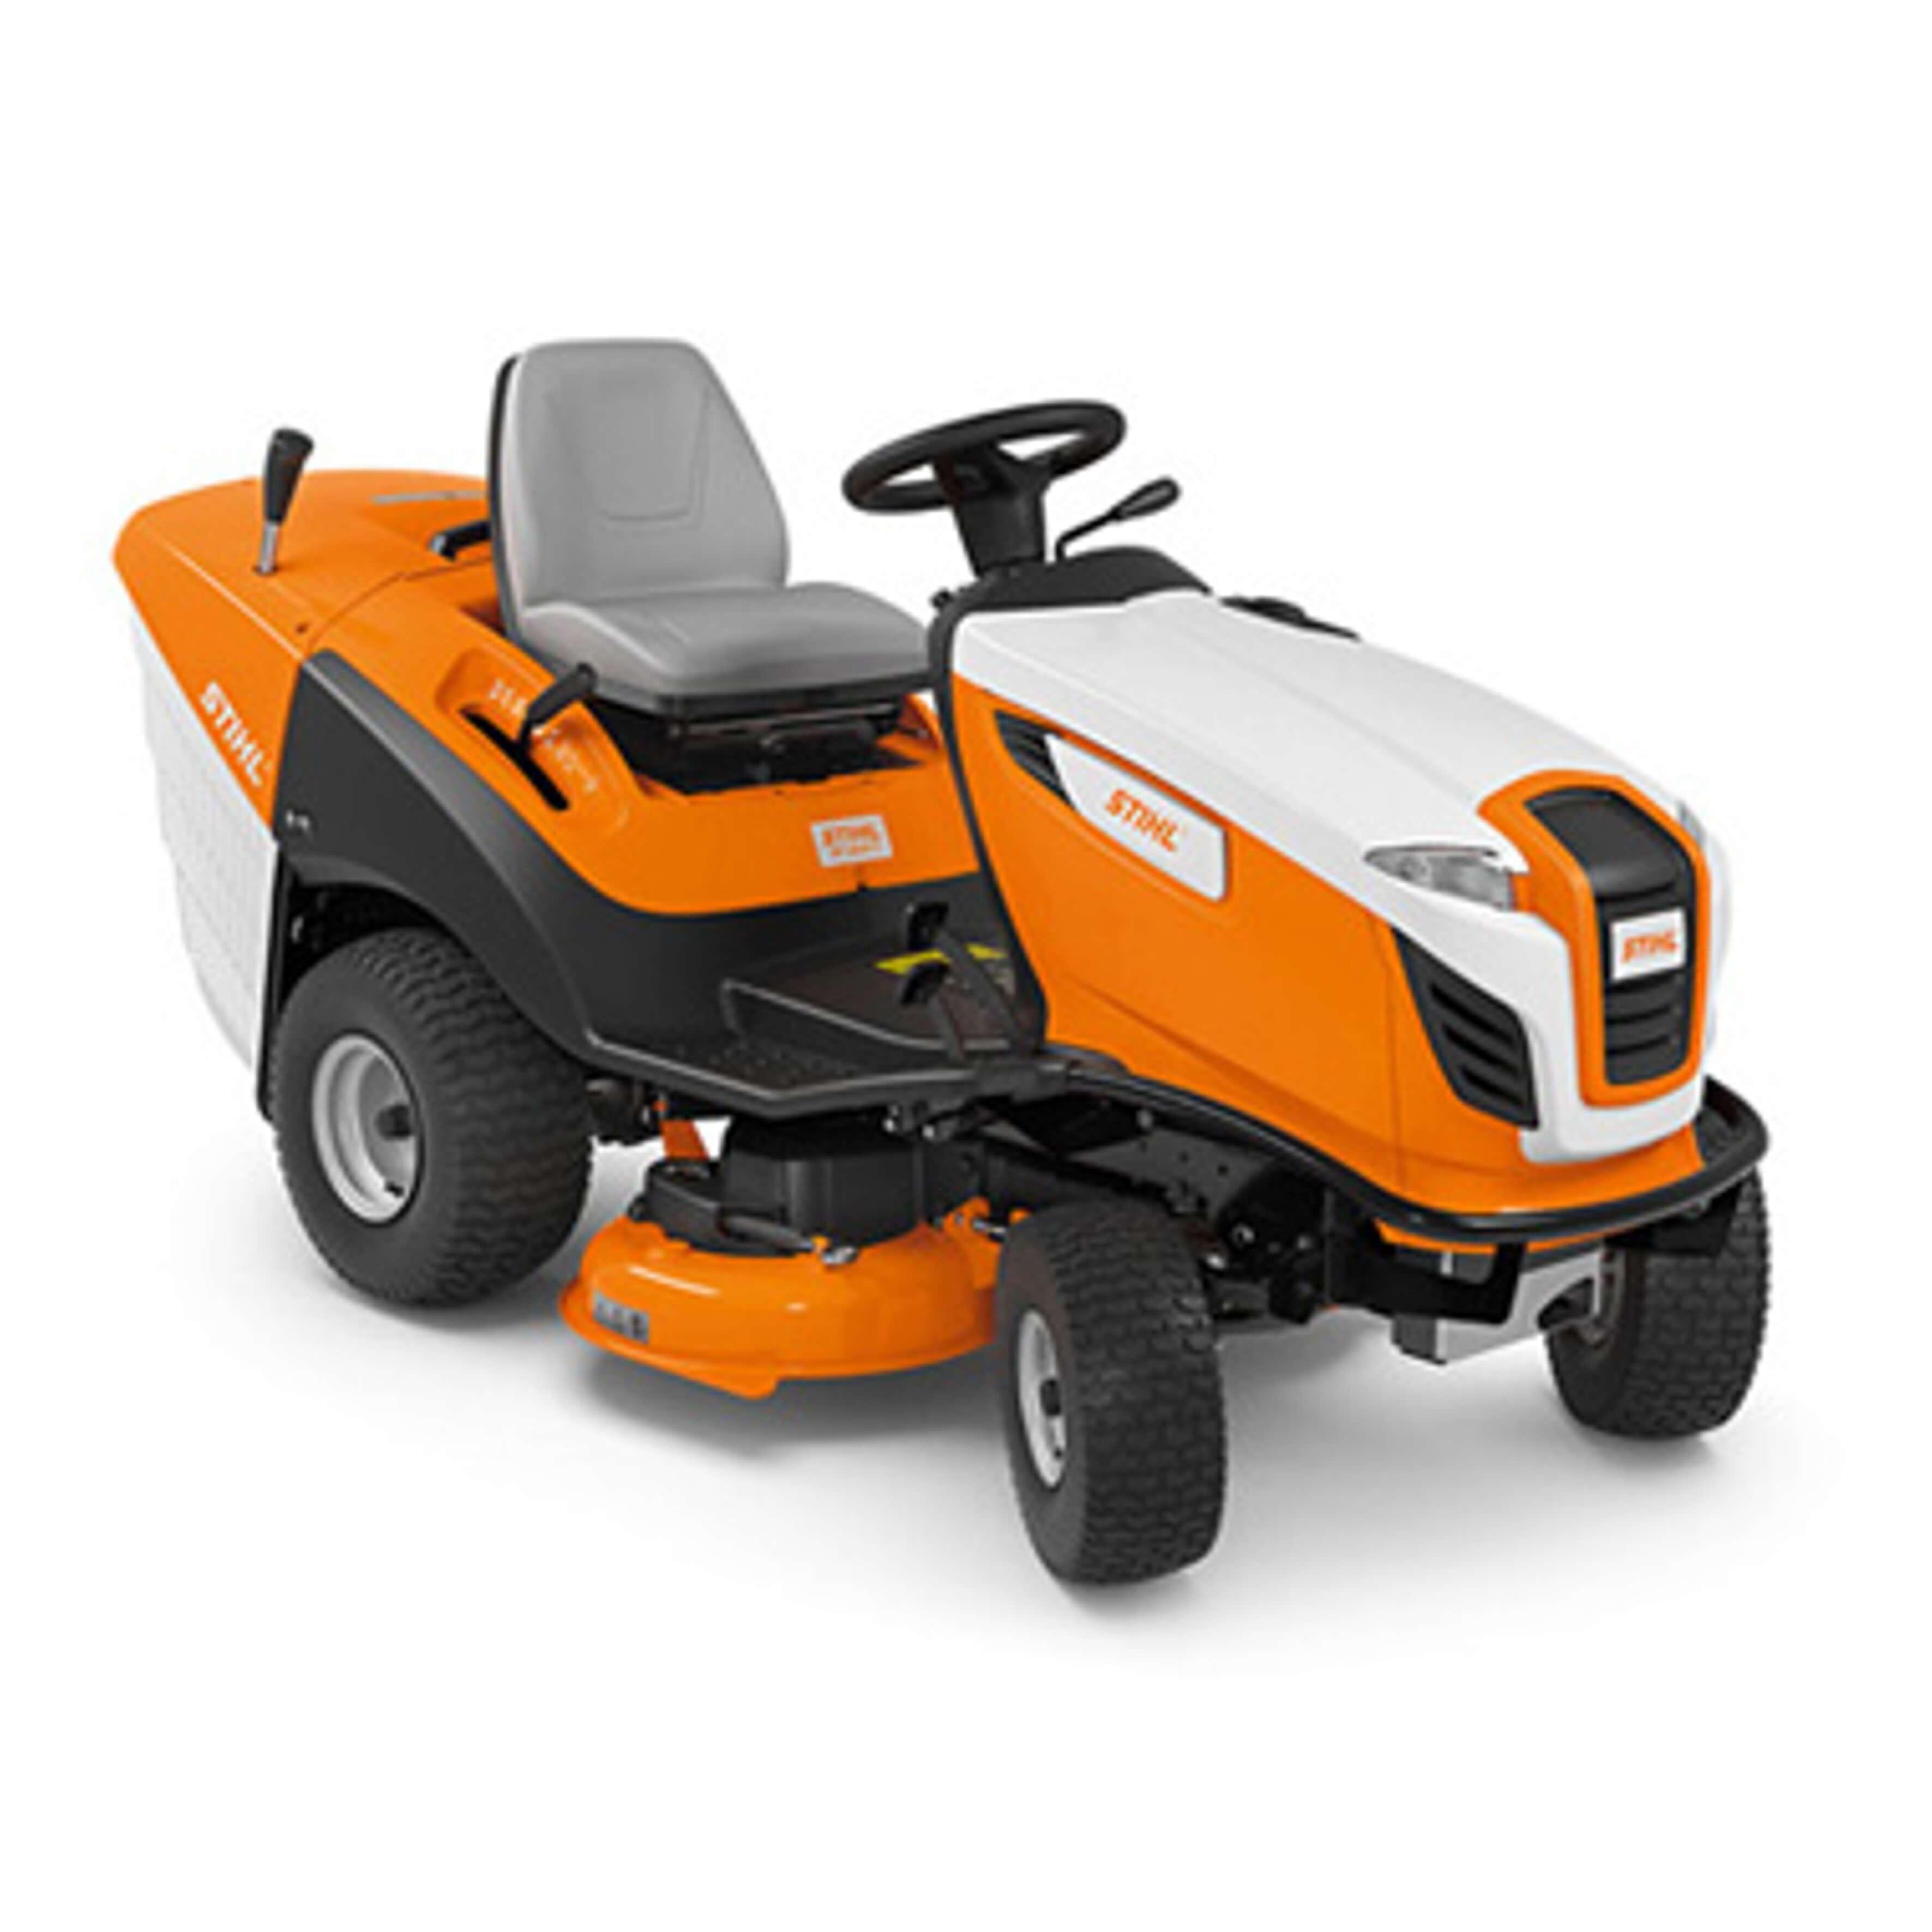 Stihl RT 5097.0 C Ride on Mower Parts